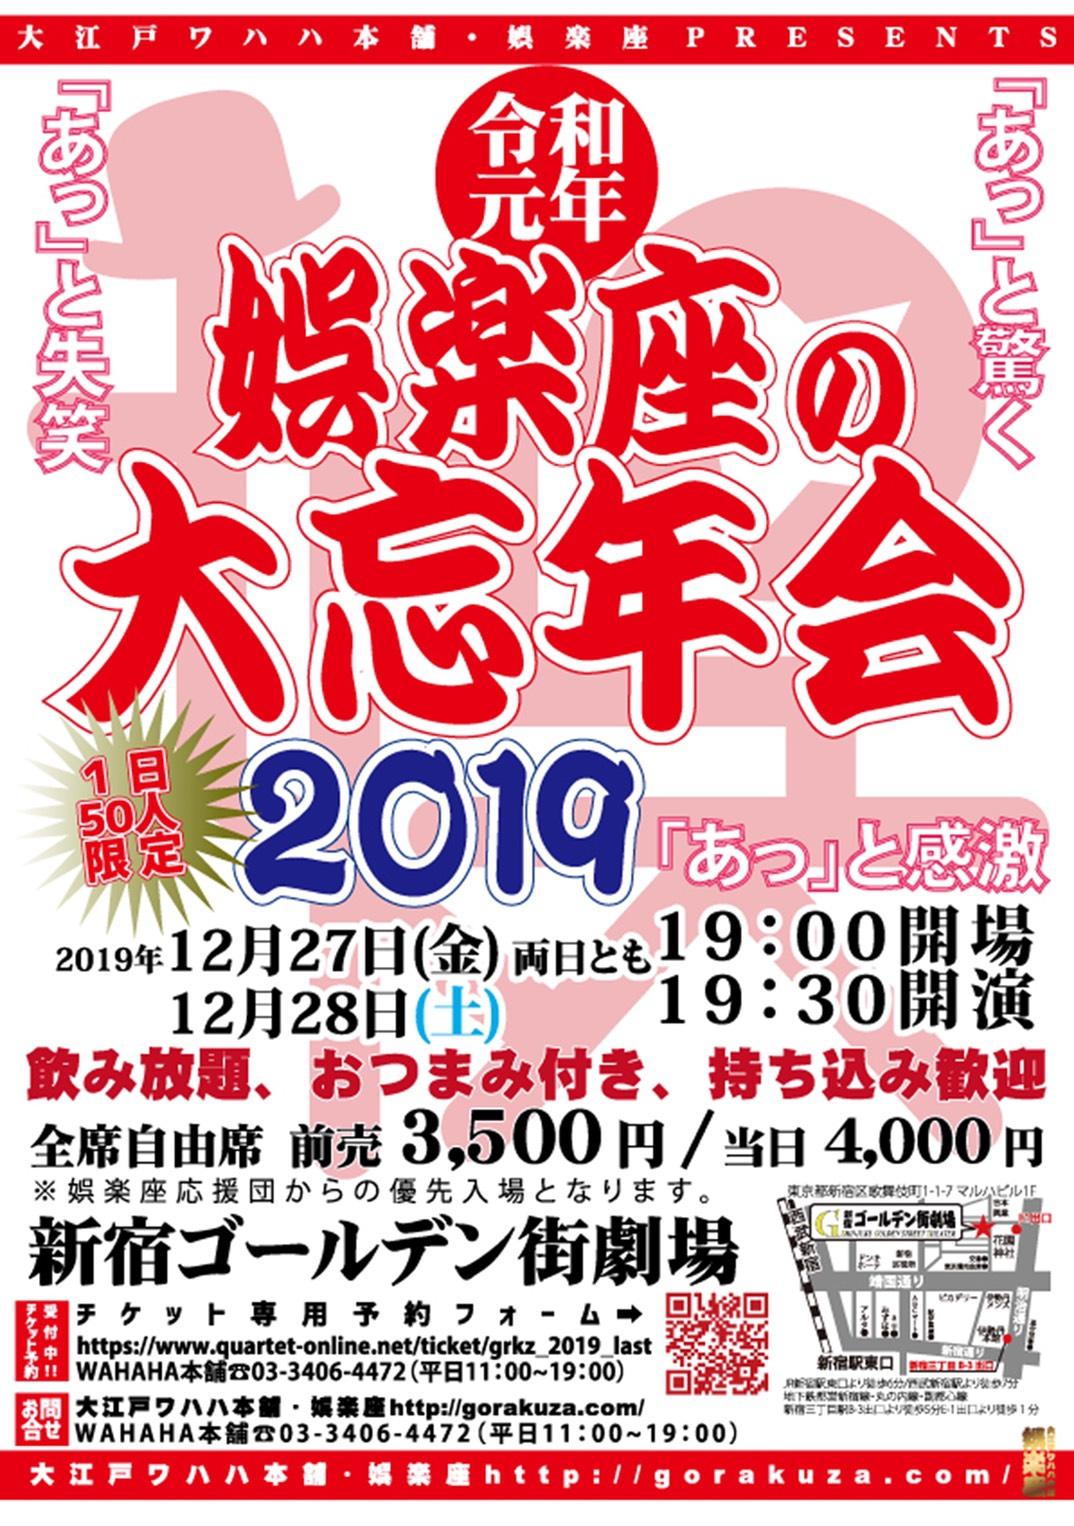 《娯楽座公演》大江戸ワハハ本舗・娯楽座PRESENTS「娯楽座の大忘年会2019」